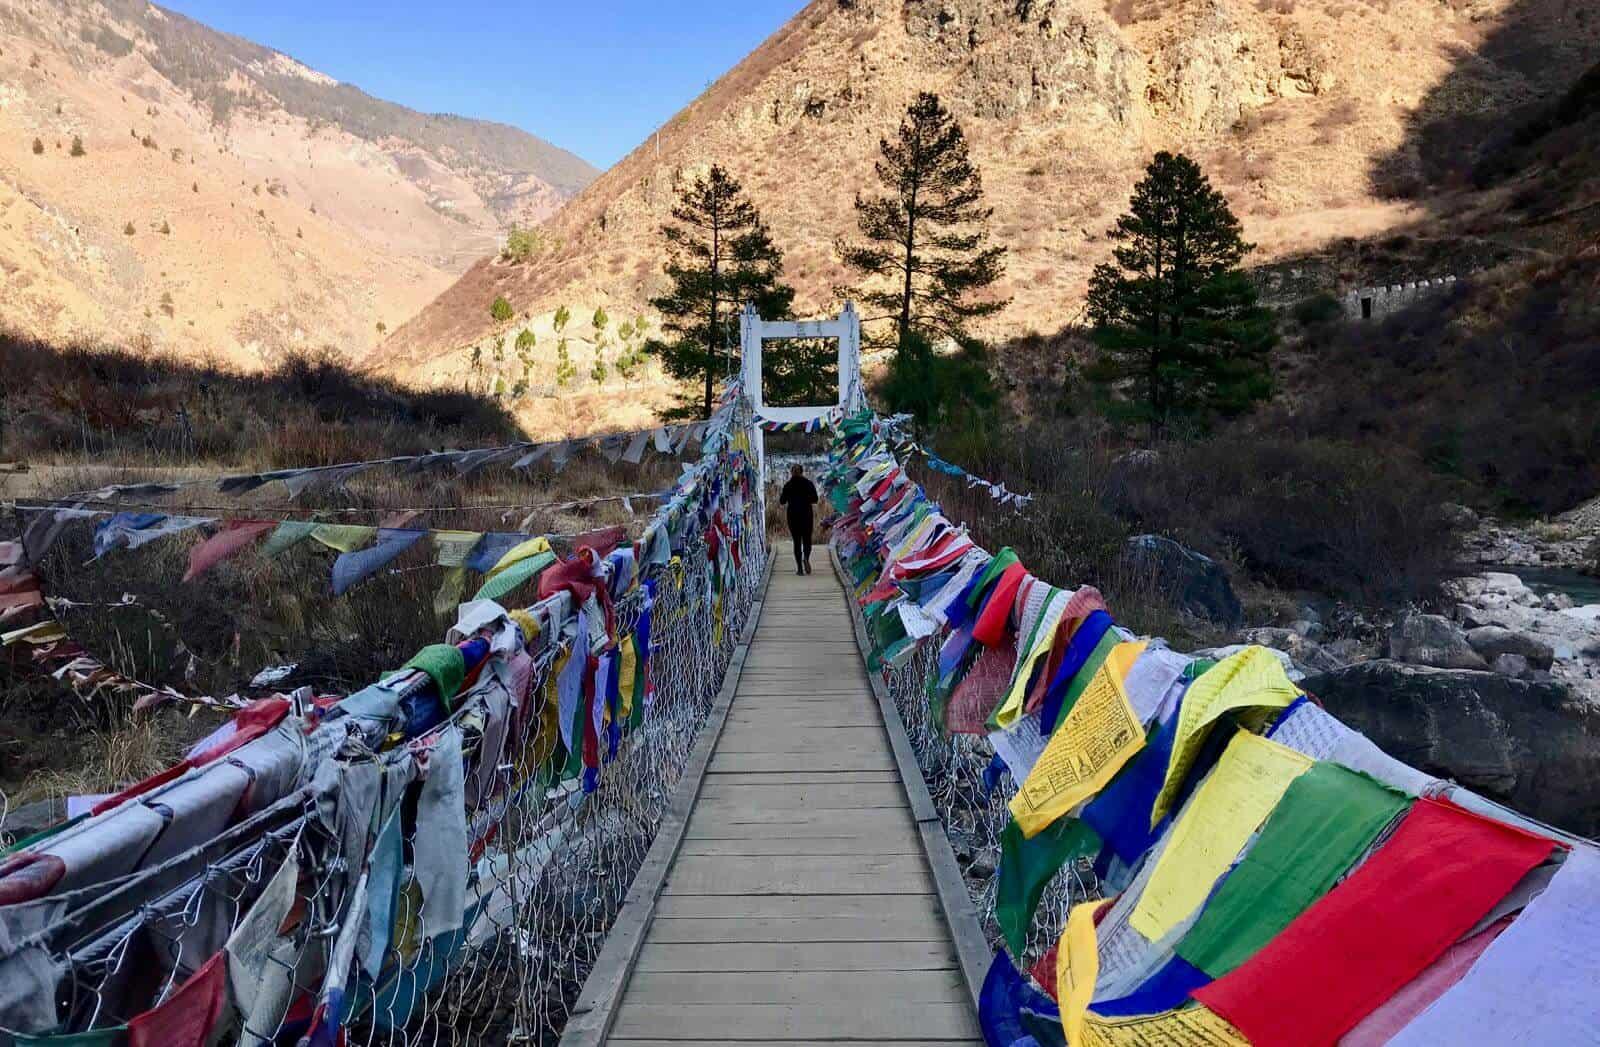 Bhutan road trip betternotstop Hannah p